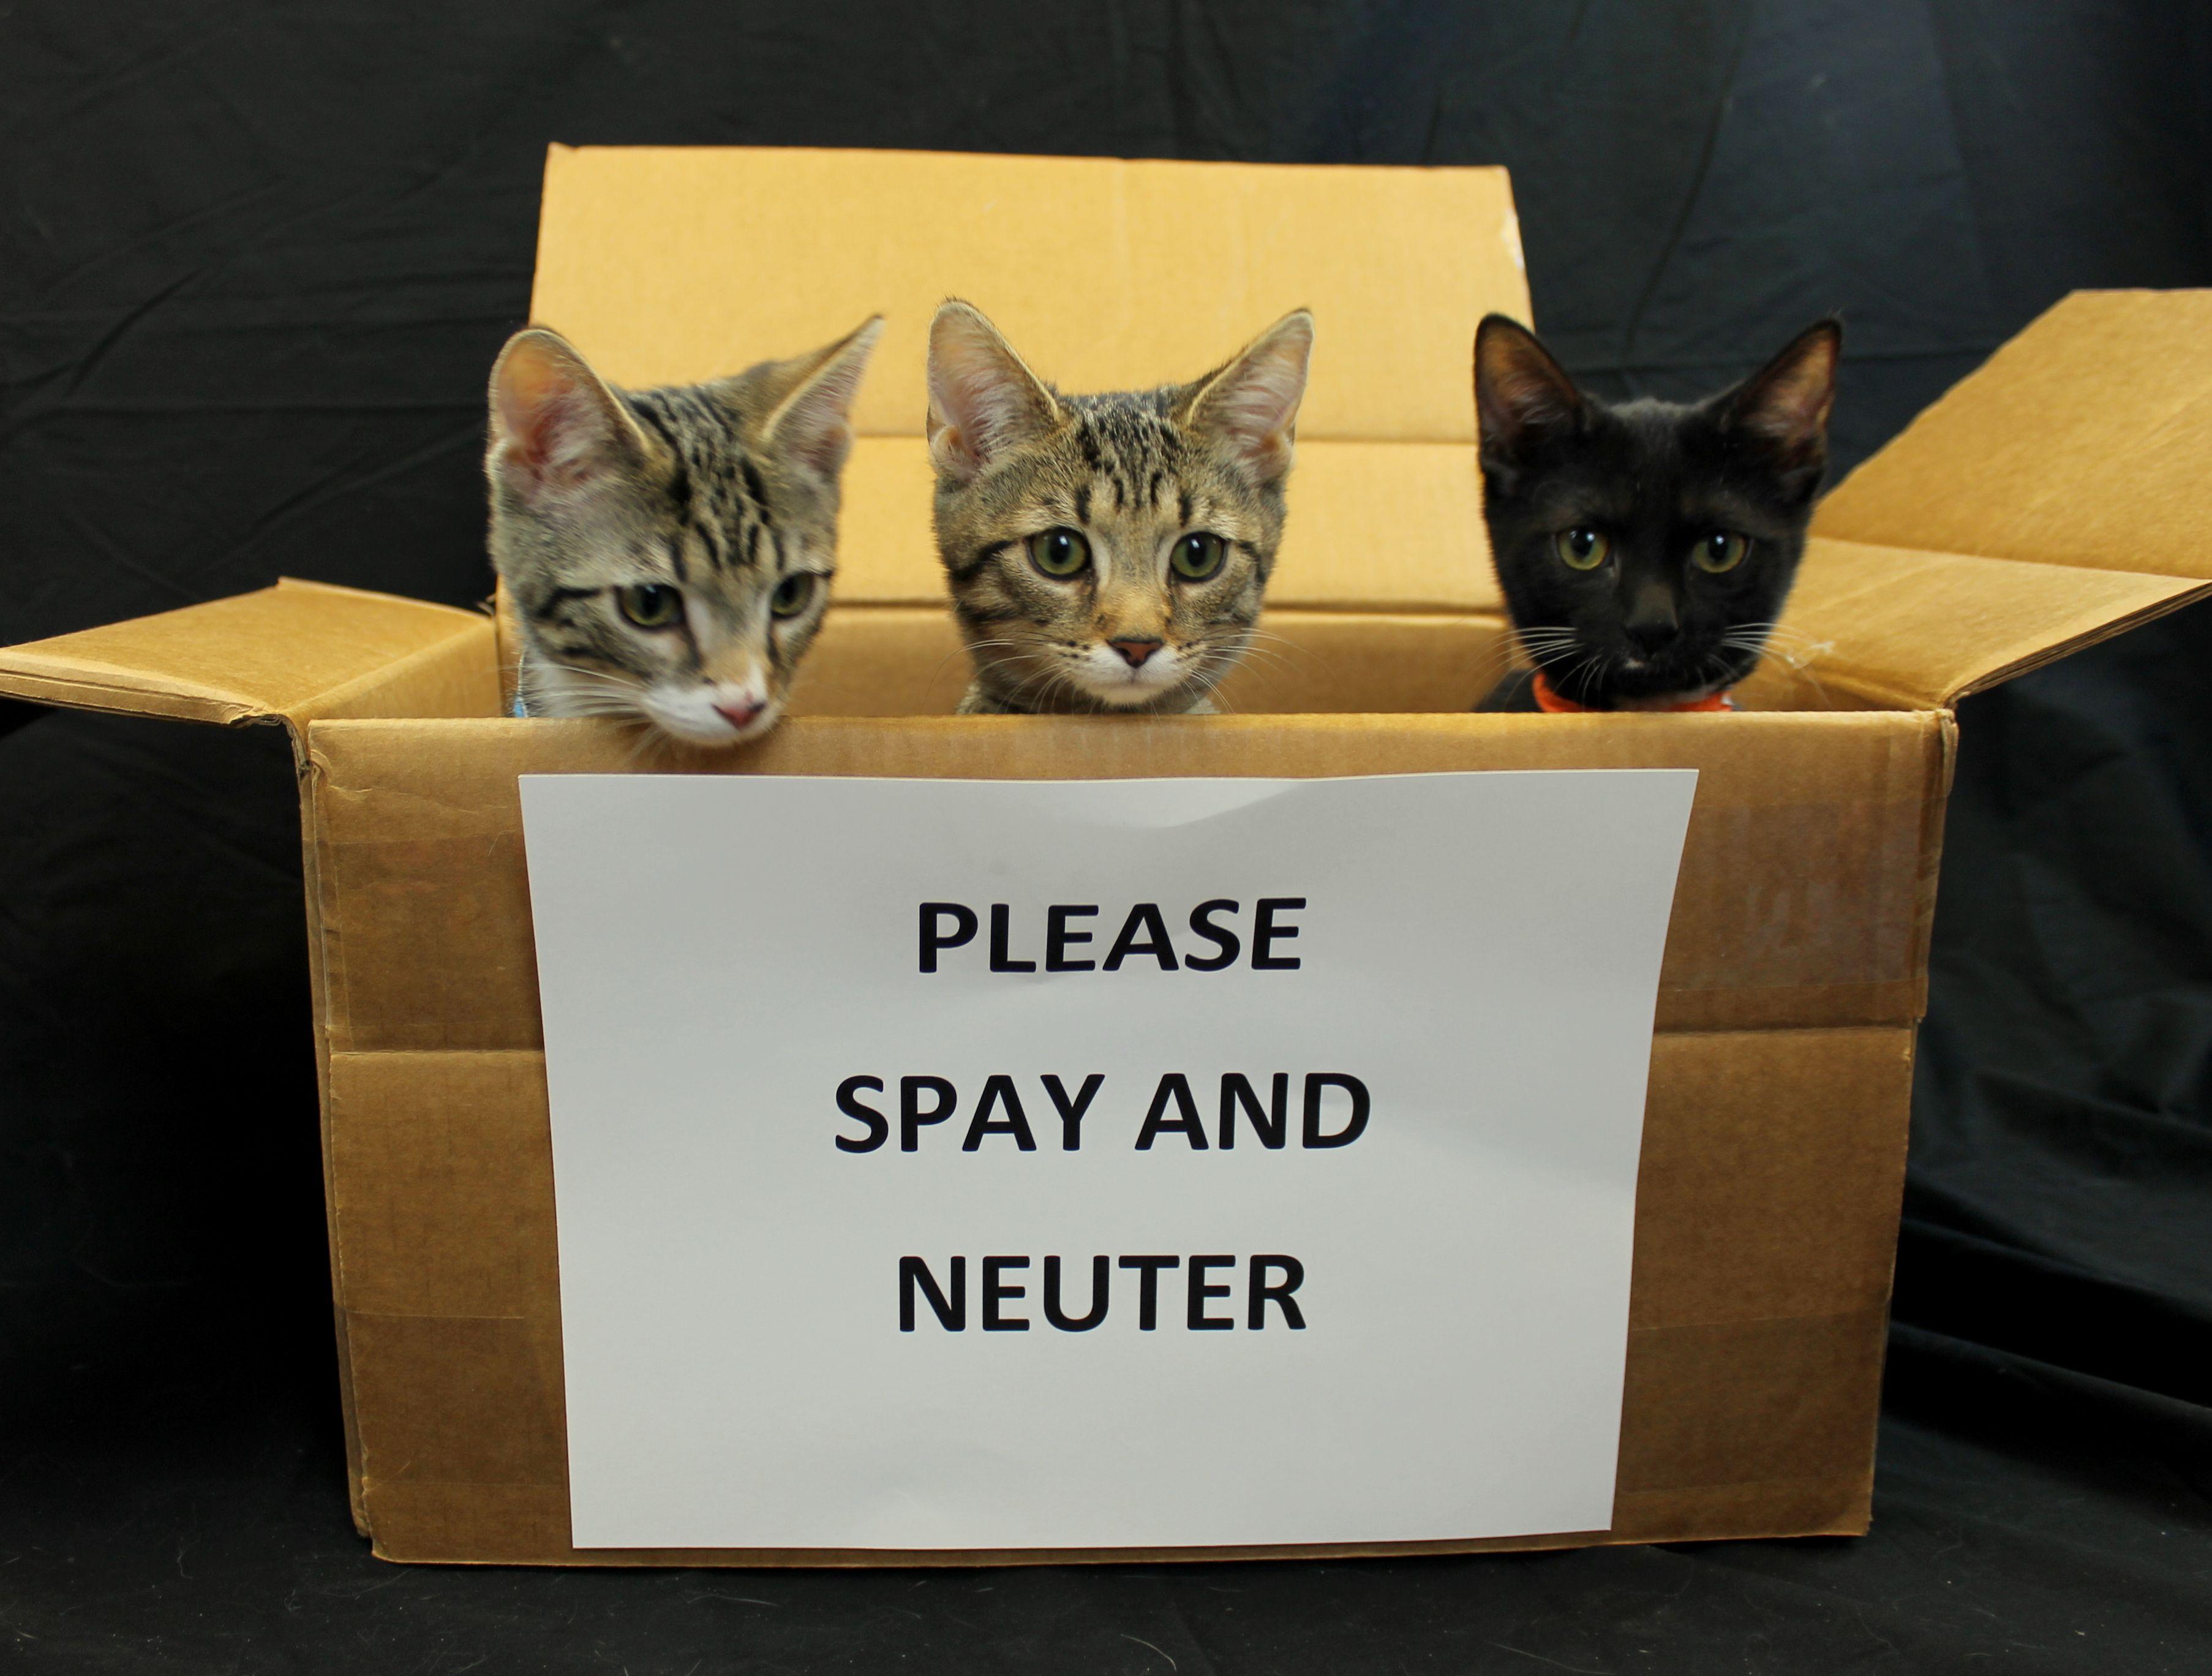 Spay and Neuter Animal hospital, Neuter, Pets